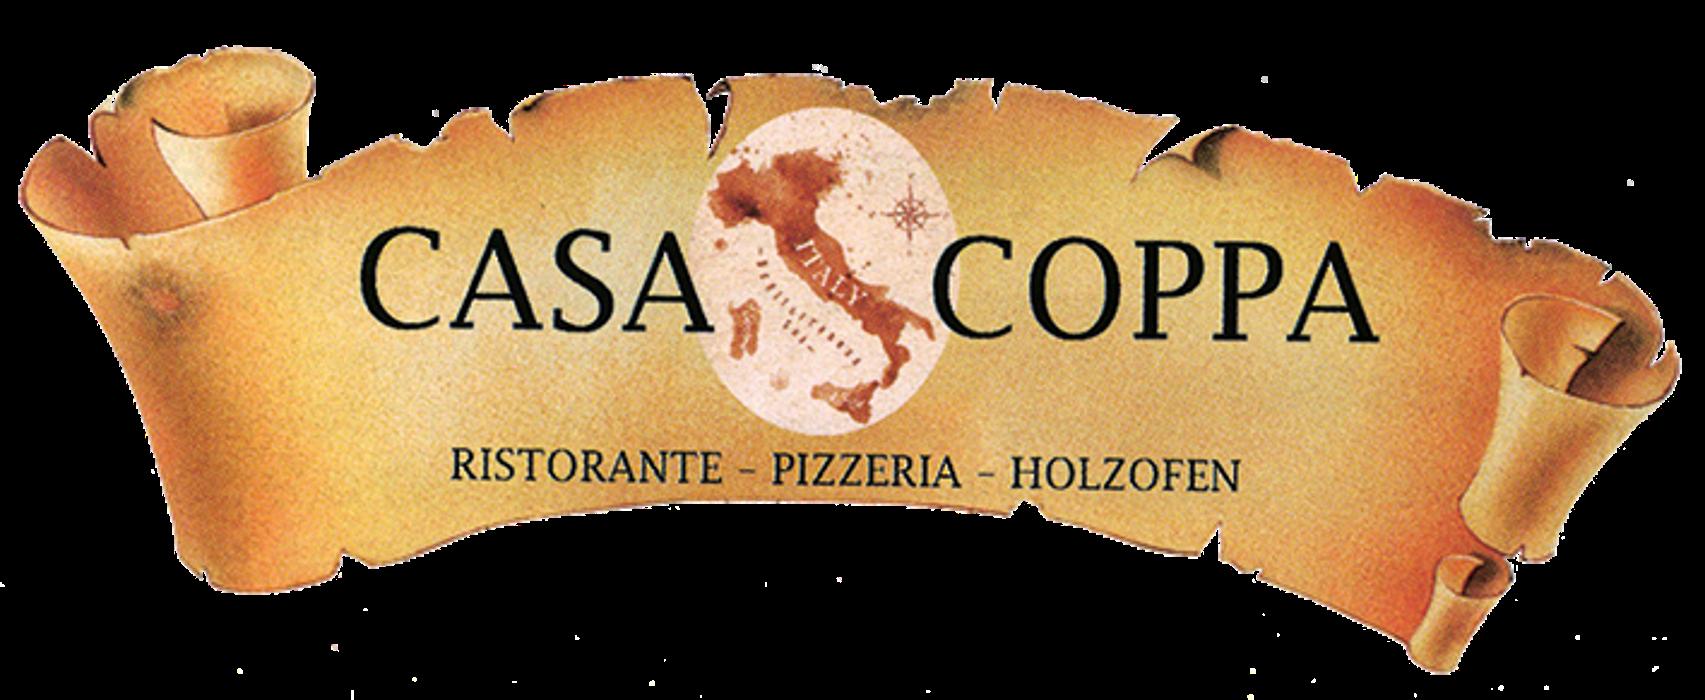 Bild zu Restaurant-Pizzeria Casa-Coppa in Meitingen